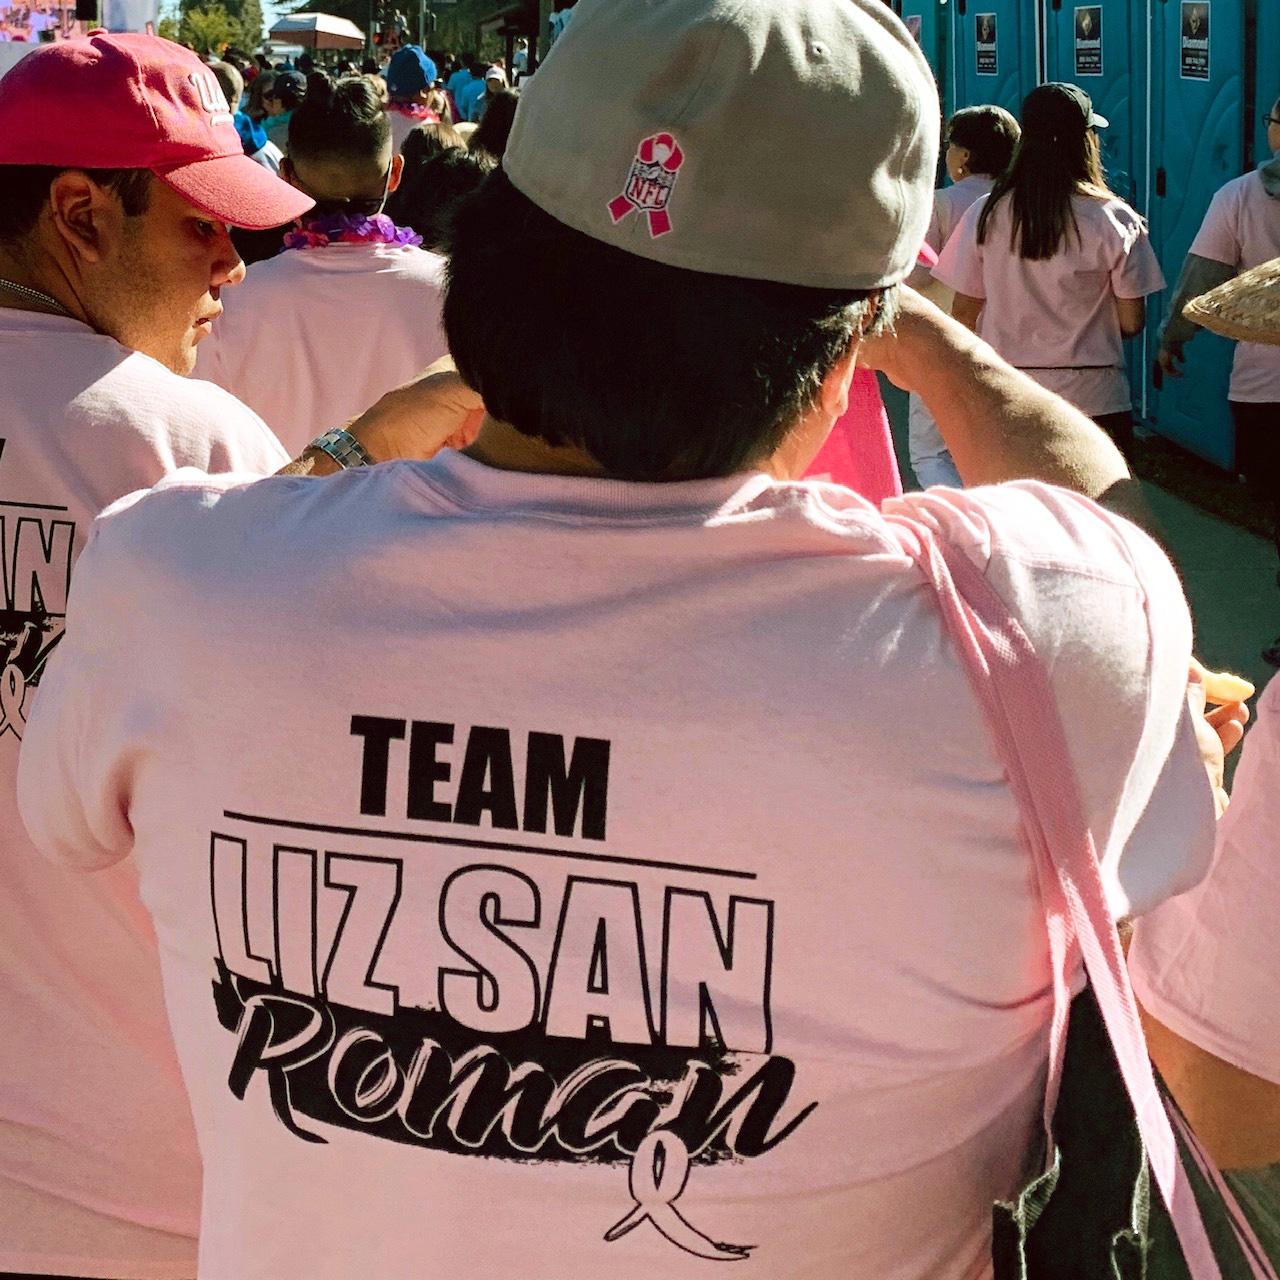 Team Liz San Roman shirts in memory of Mr. Escamilla's sister